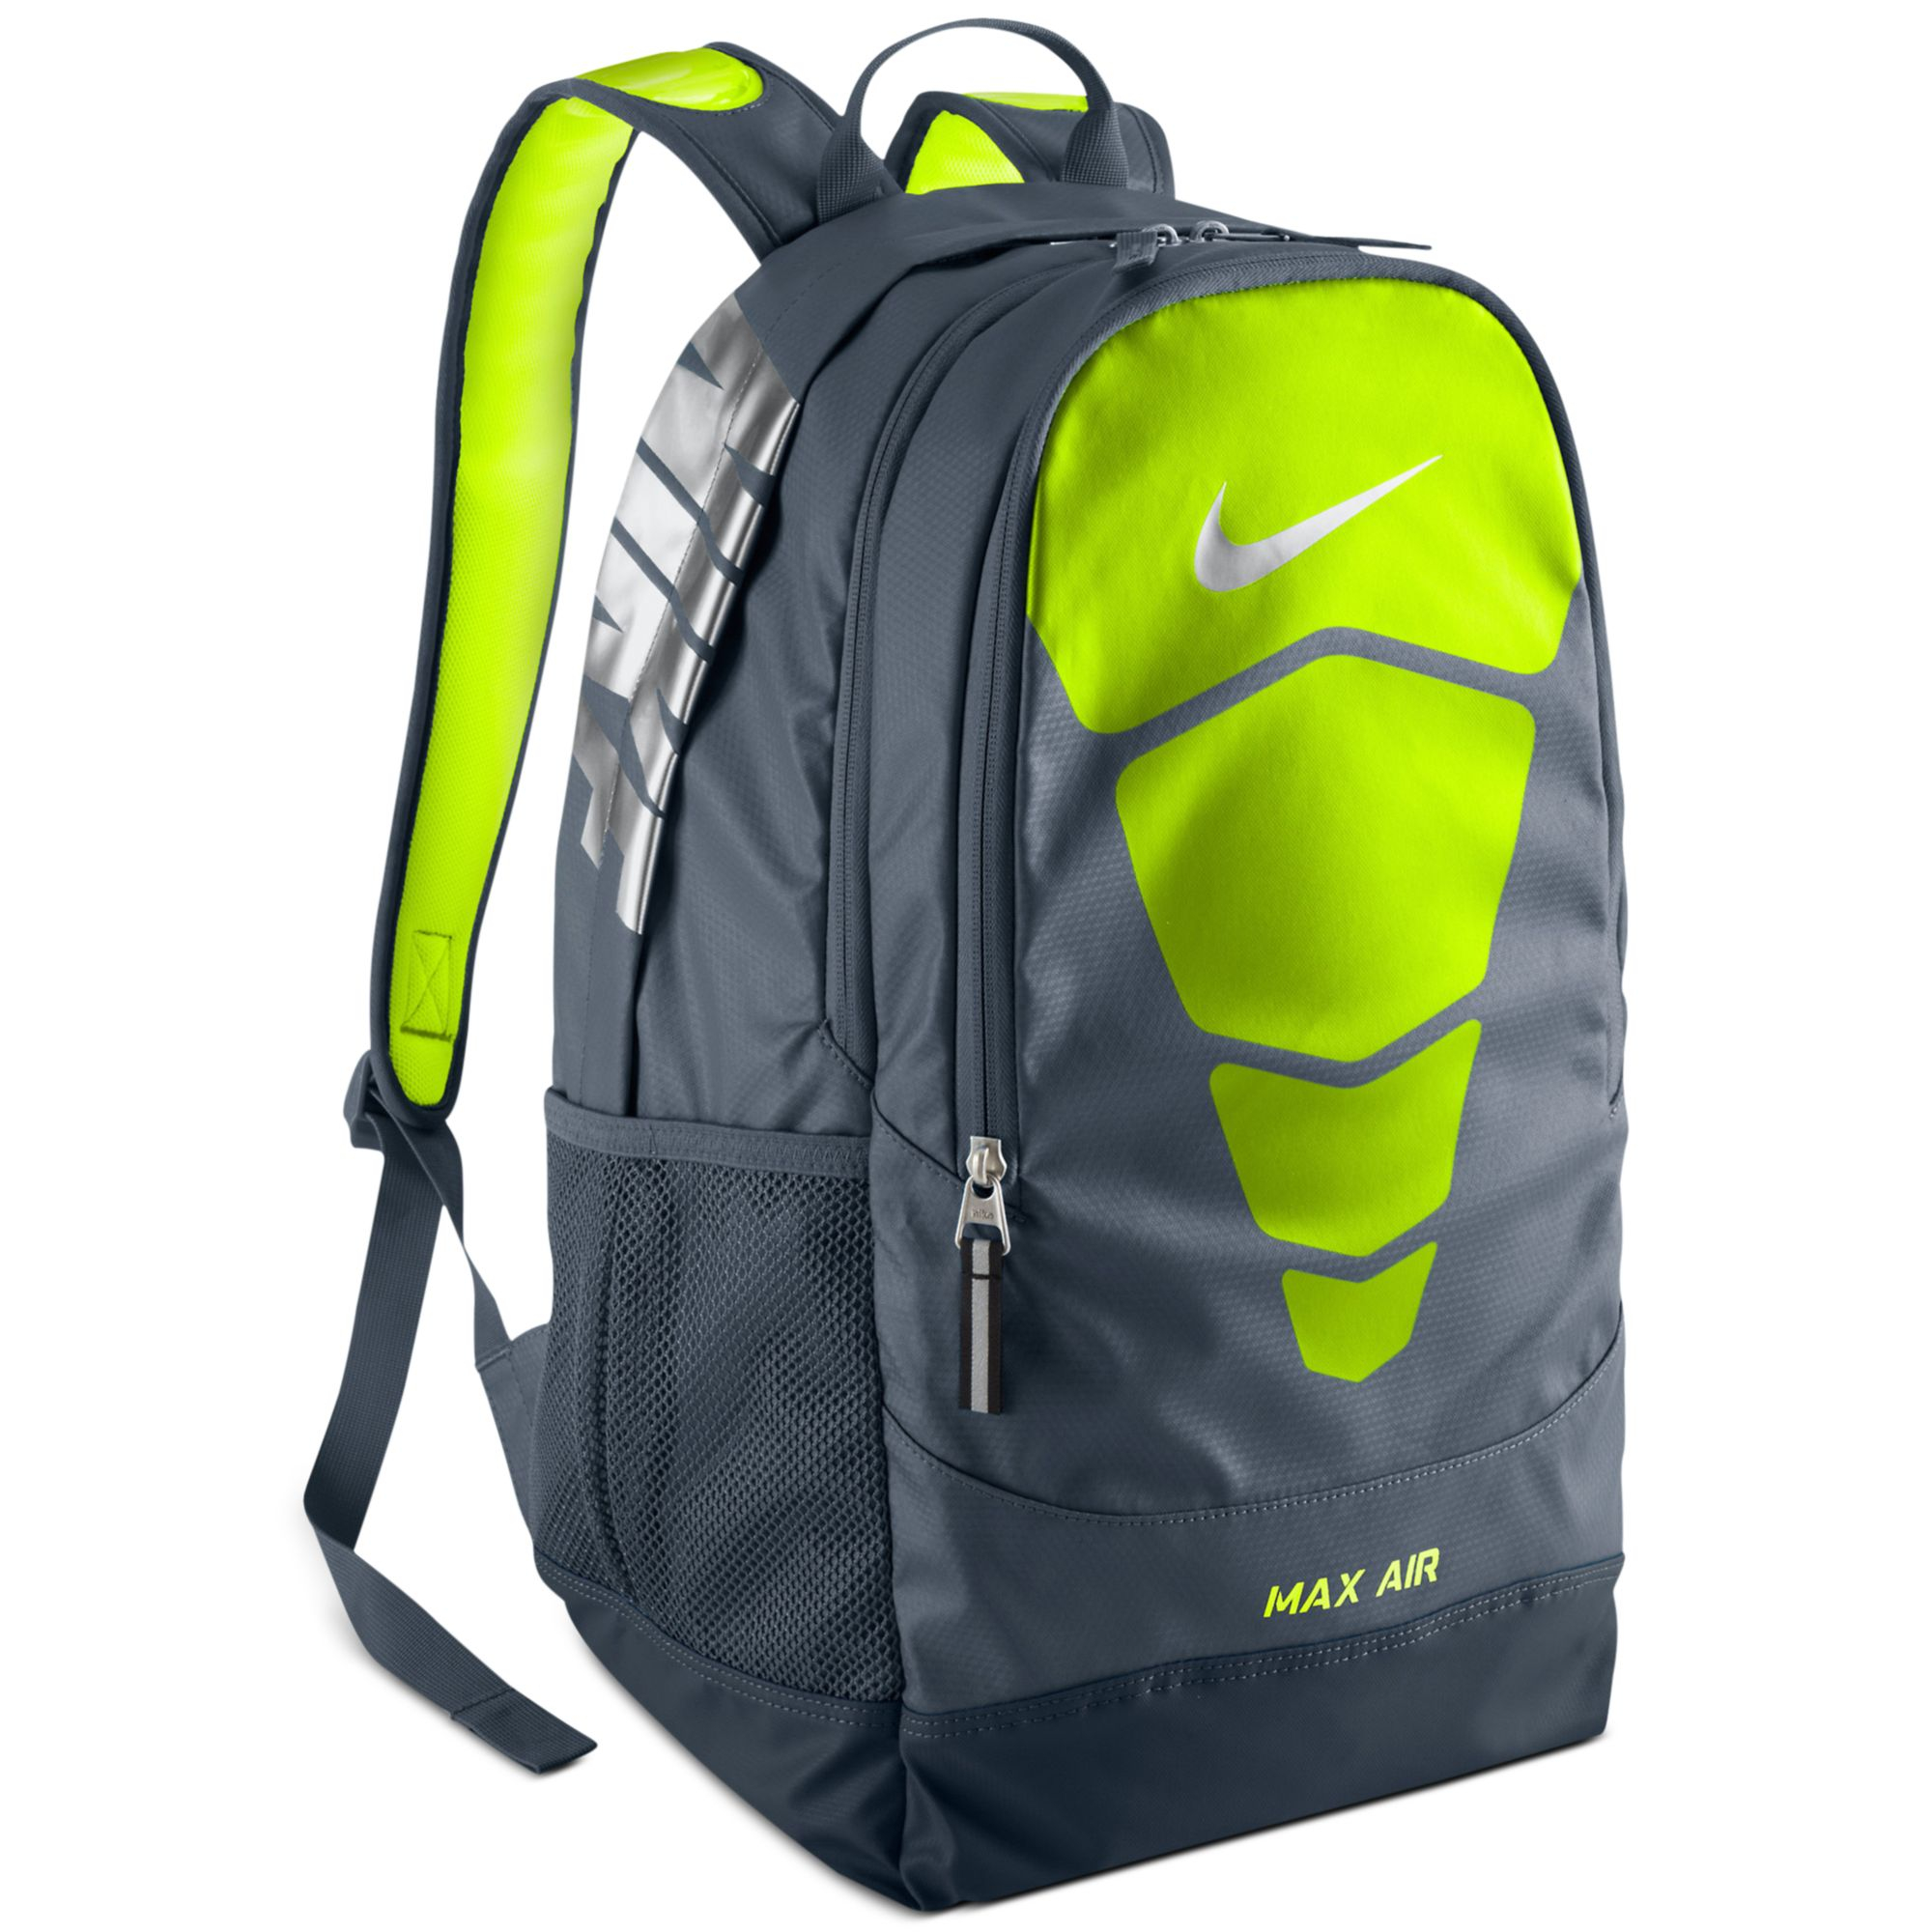 Backpack max air nike grey